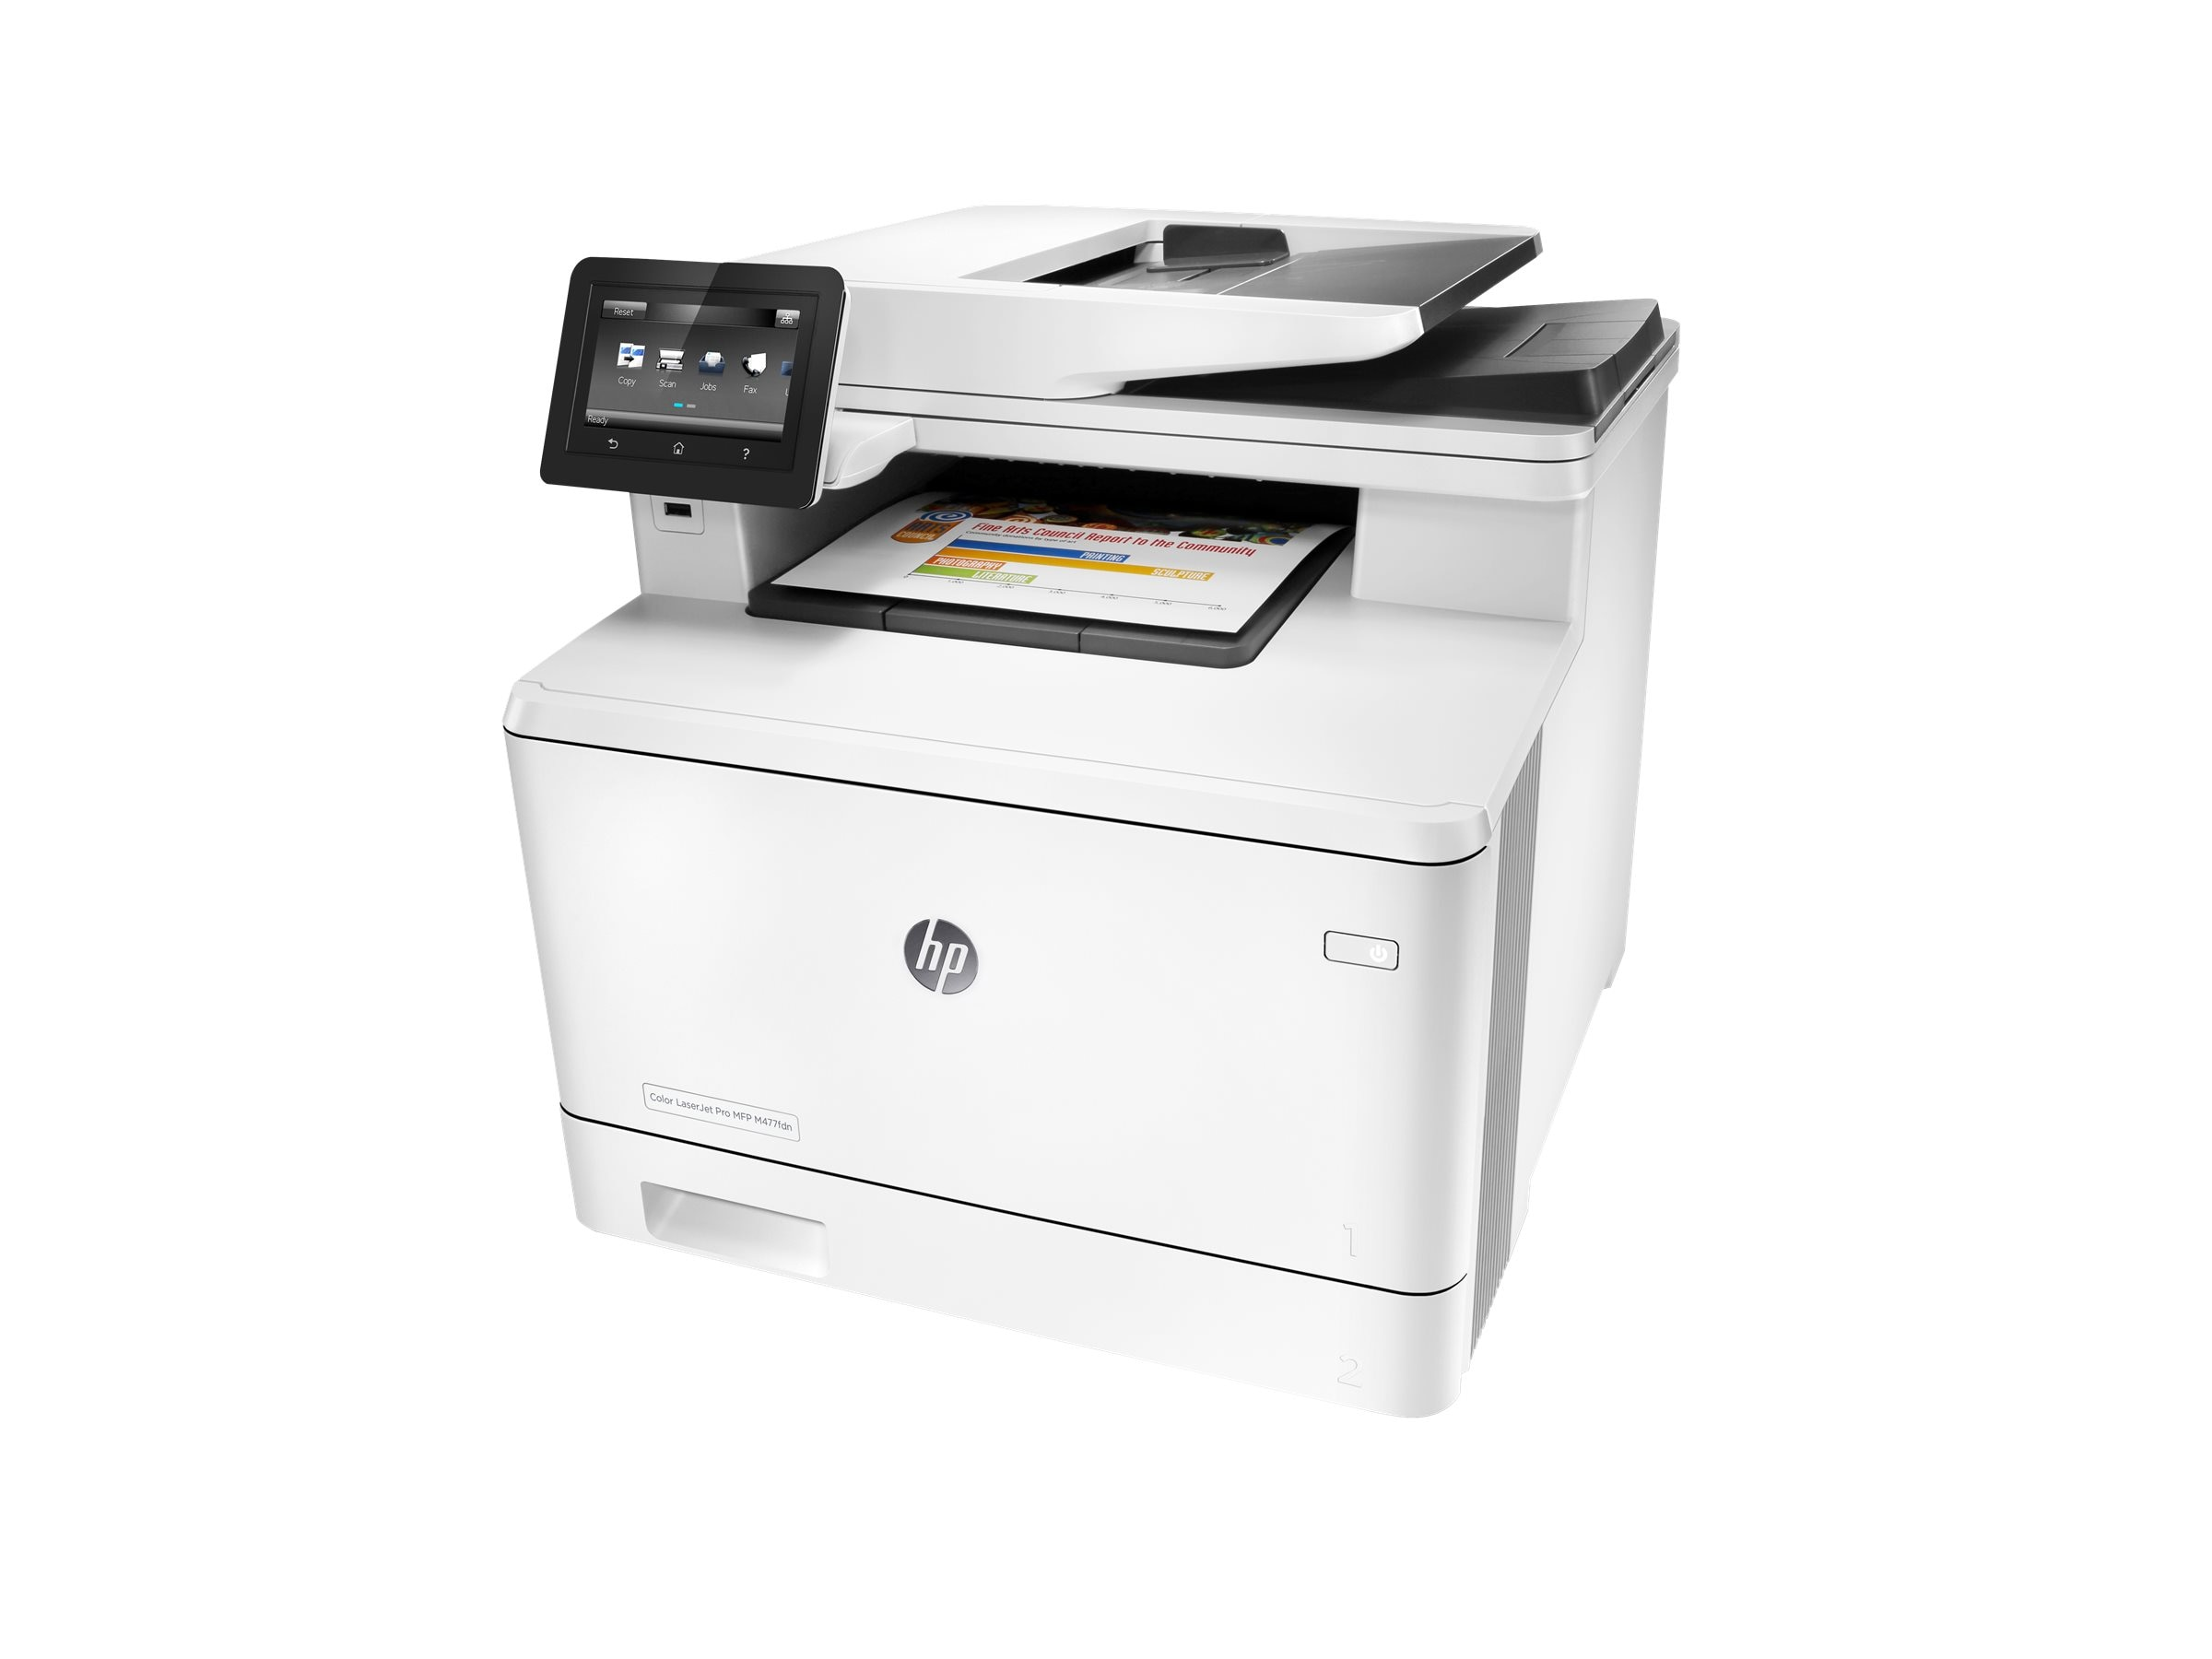 HP Color LaserJet Pro MFP M477fdn ($579-$200 IR = $379. Expires 8 31 2017)